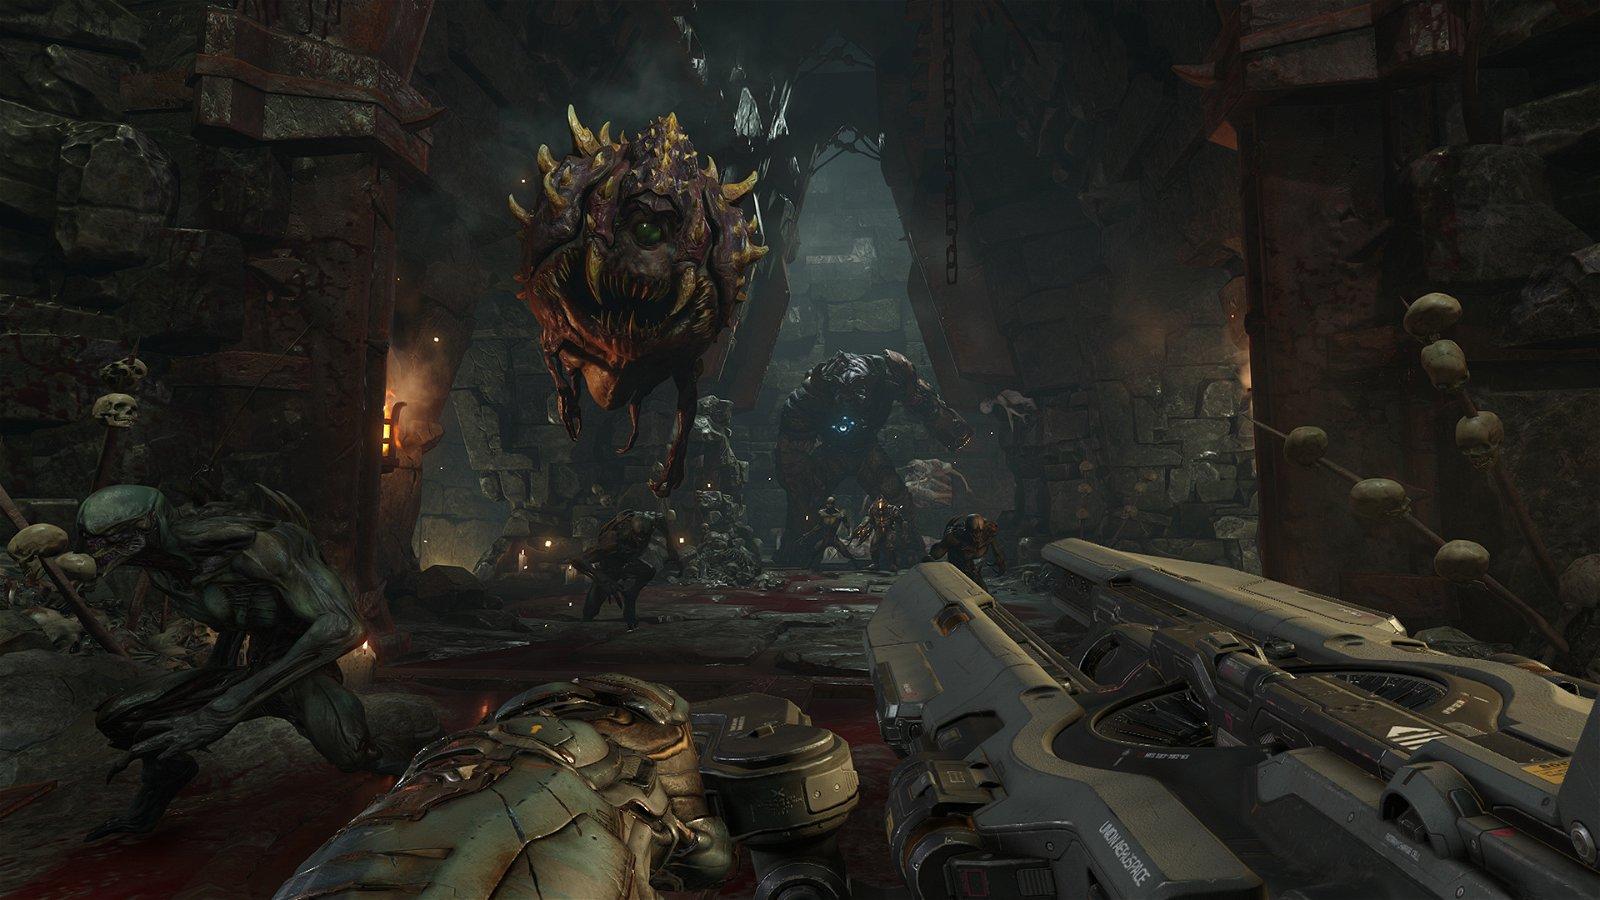 New Screenshots From Doom - 2015-07-24 12:45:26